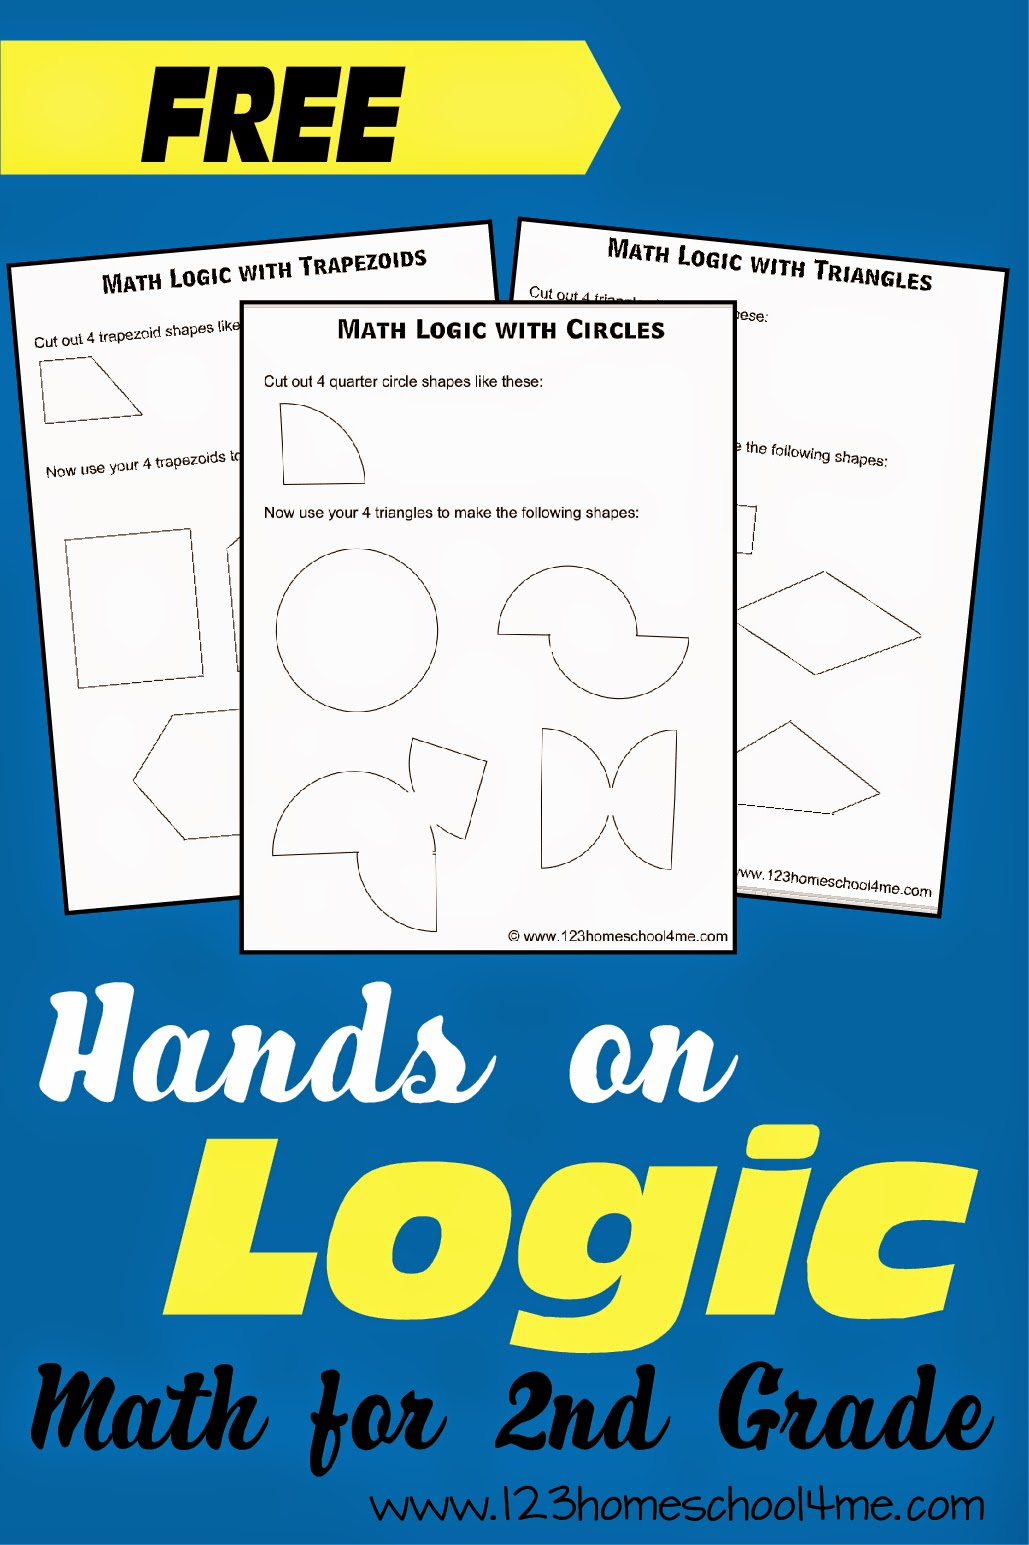 41 Easy 2nd Grade Math Problems Easy 2nd Grade Math